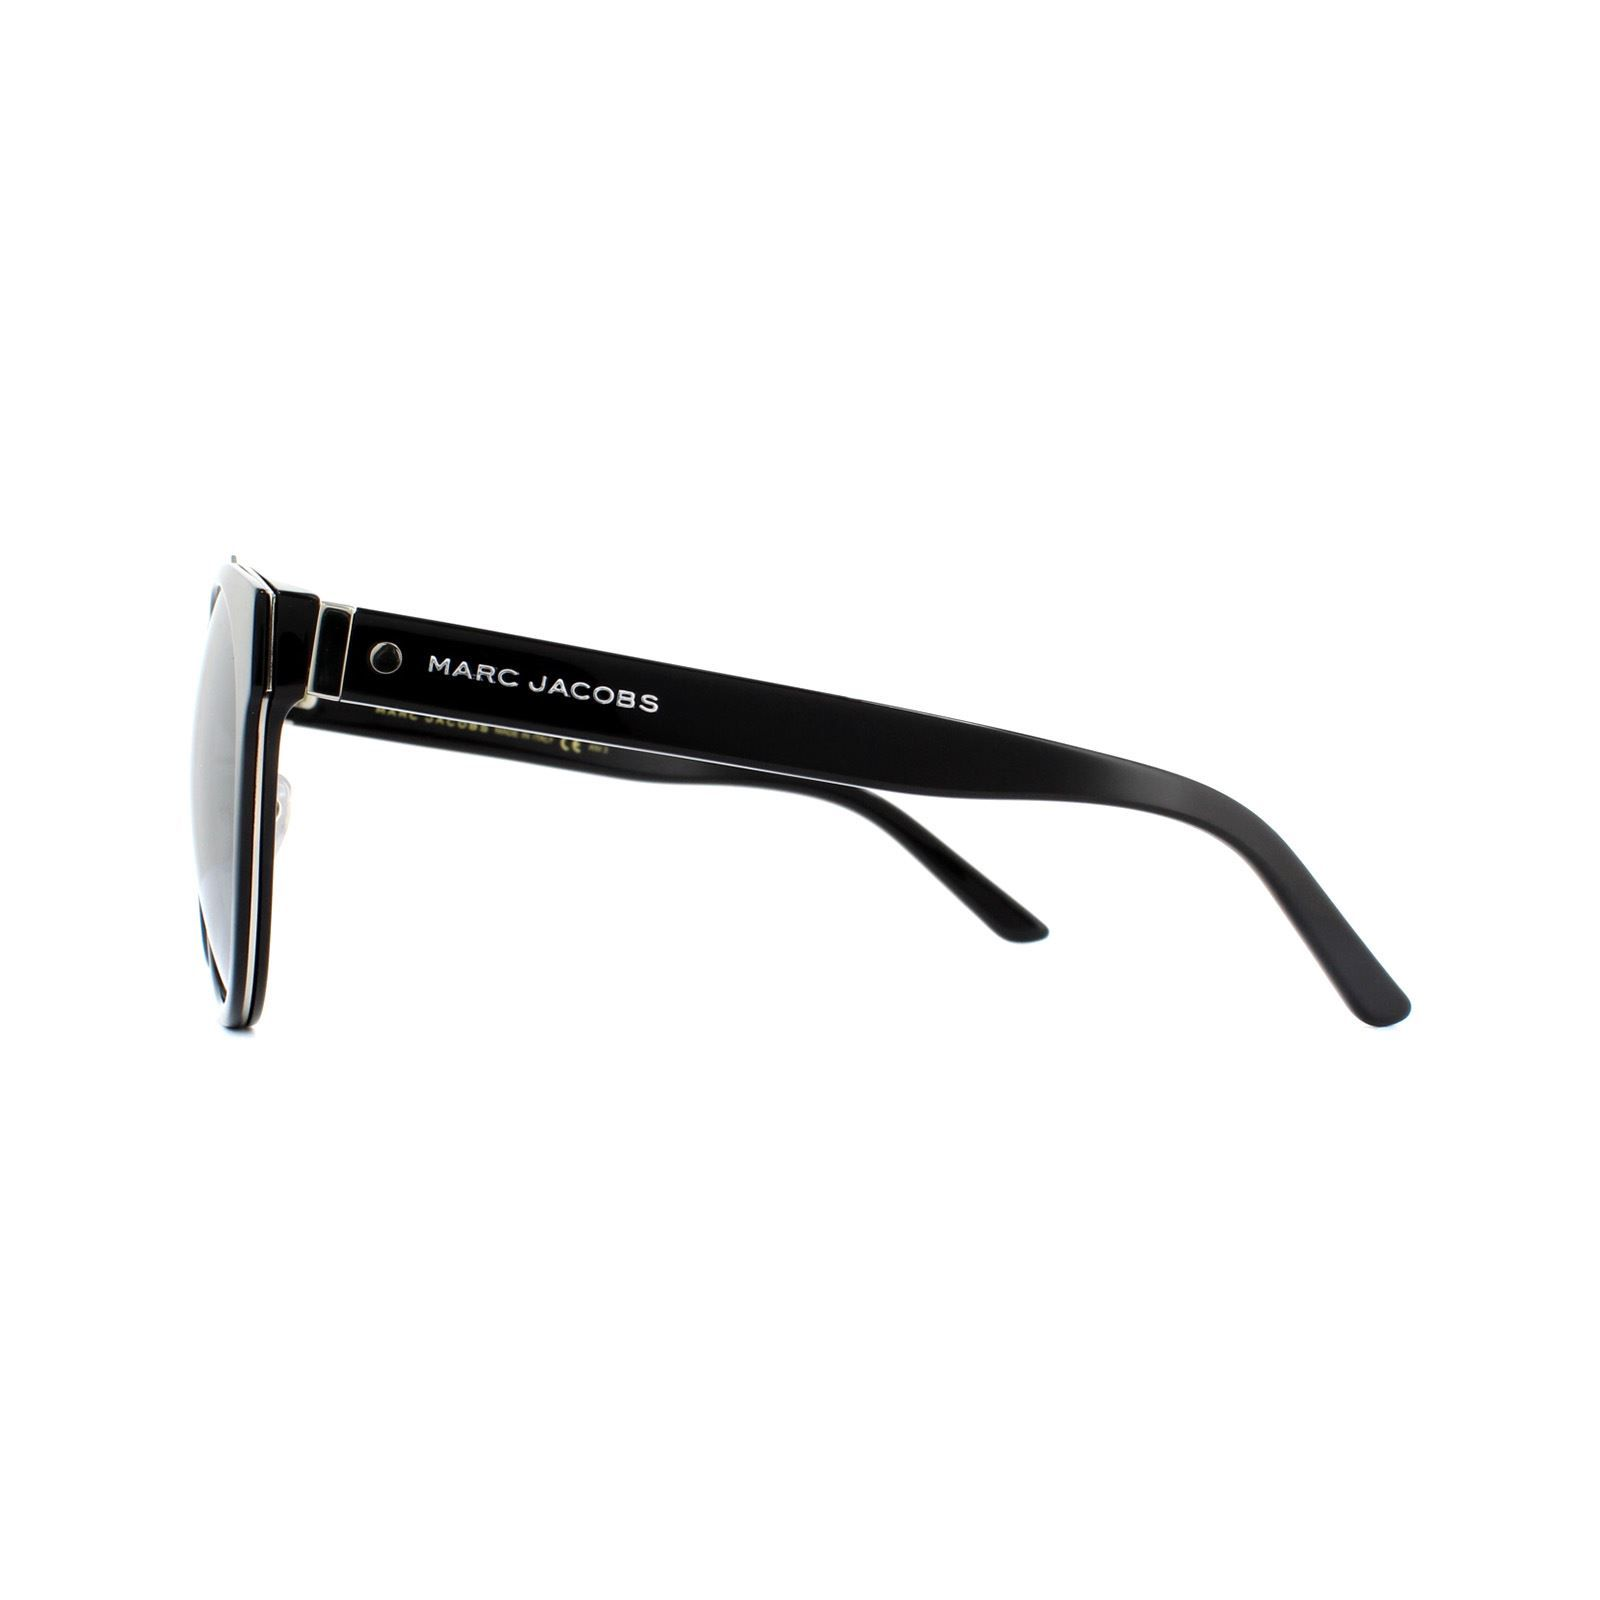 Marc Jacobs Sunglasses MARC 80/F/S 807 T4 Black Silver Mirror